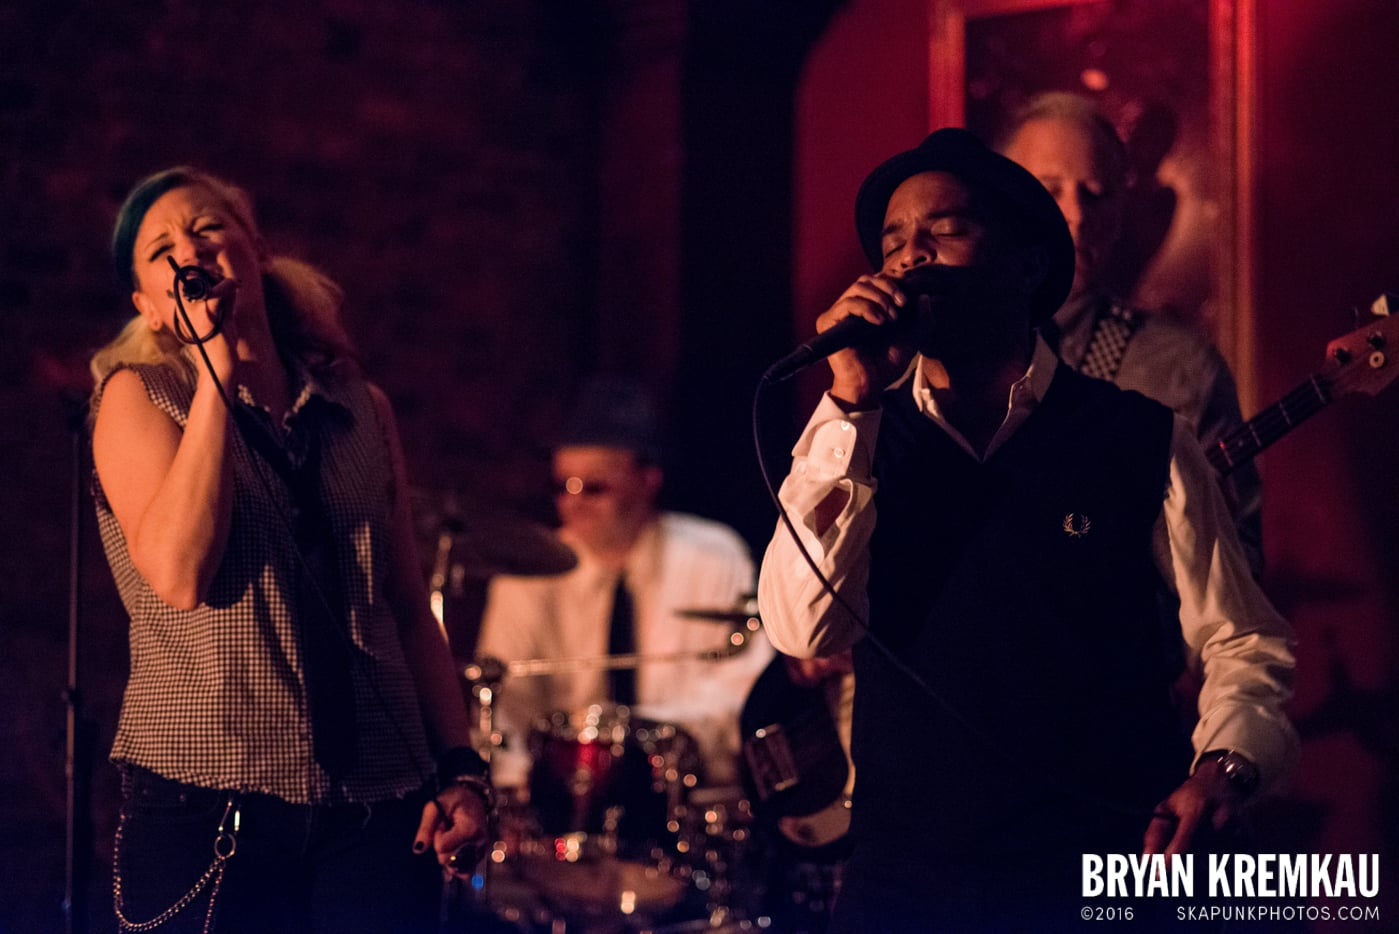 Rude Boy George @ Characters, NYC - 11.16.13 (8)